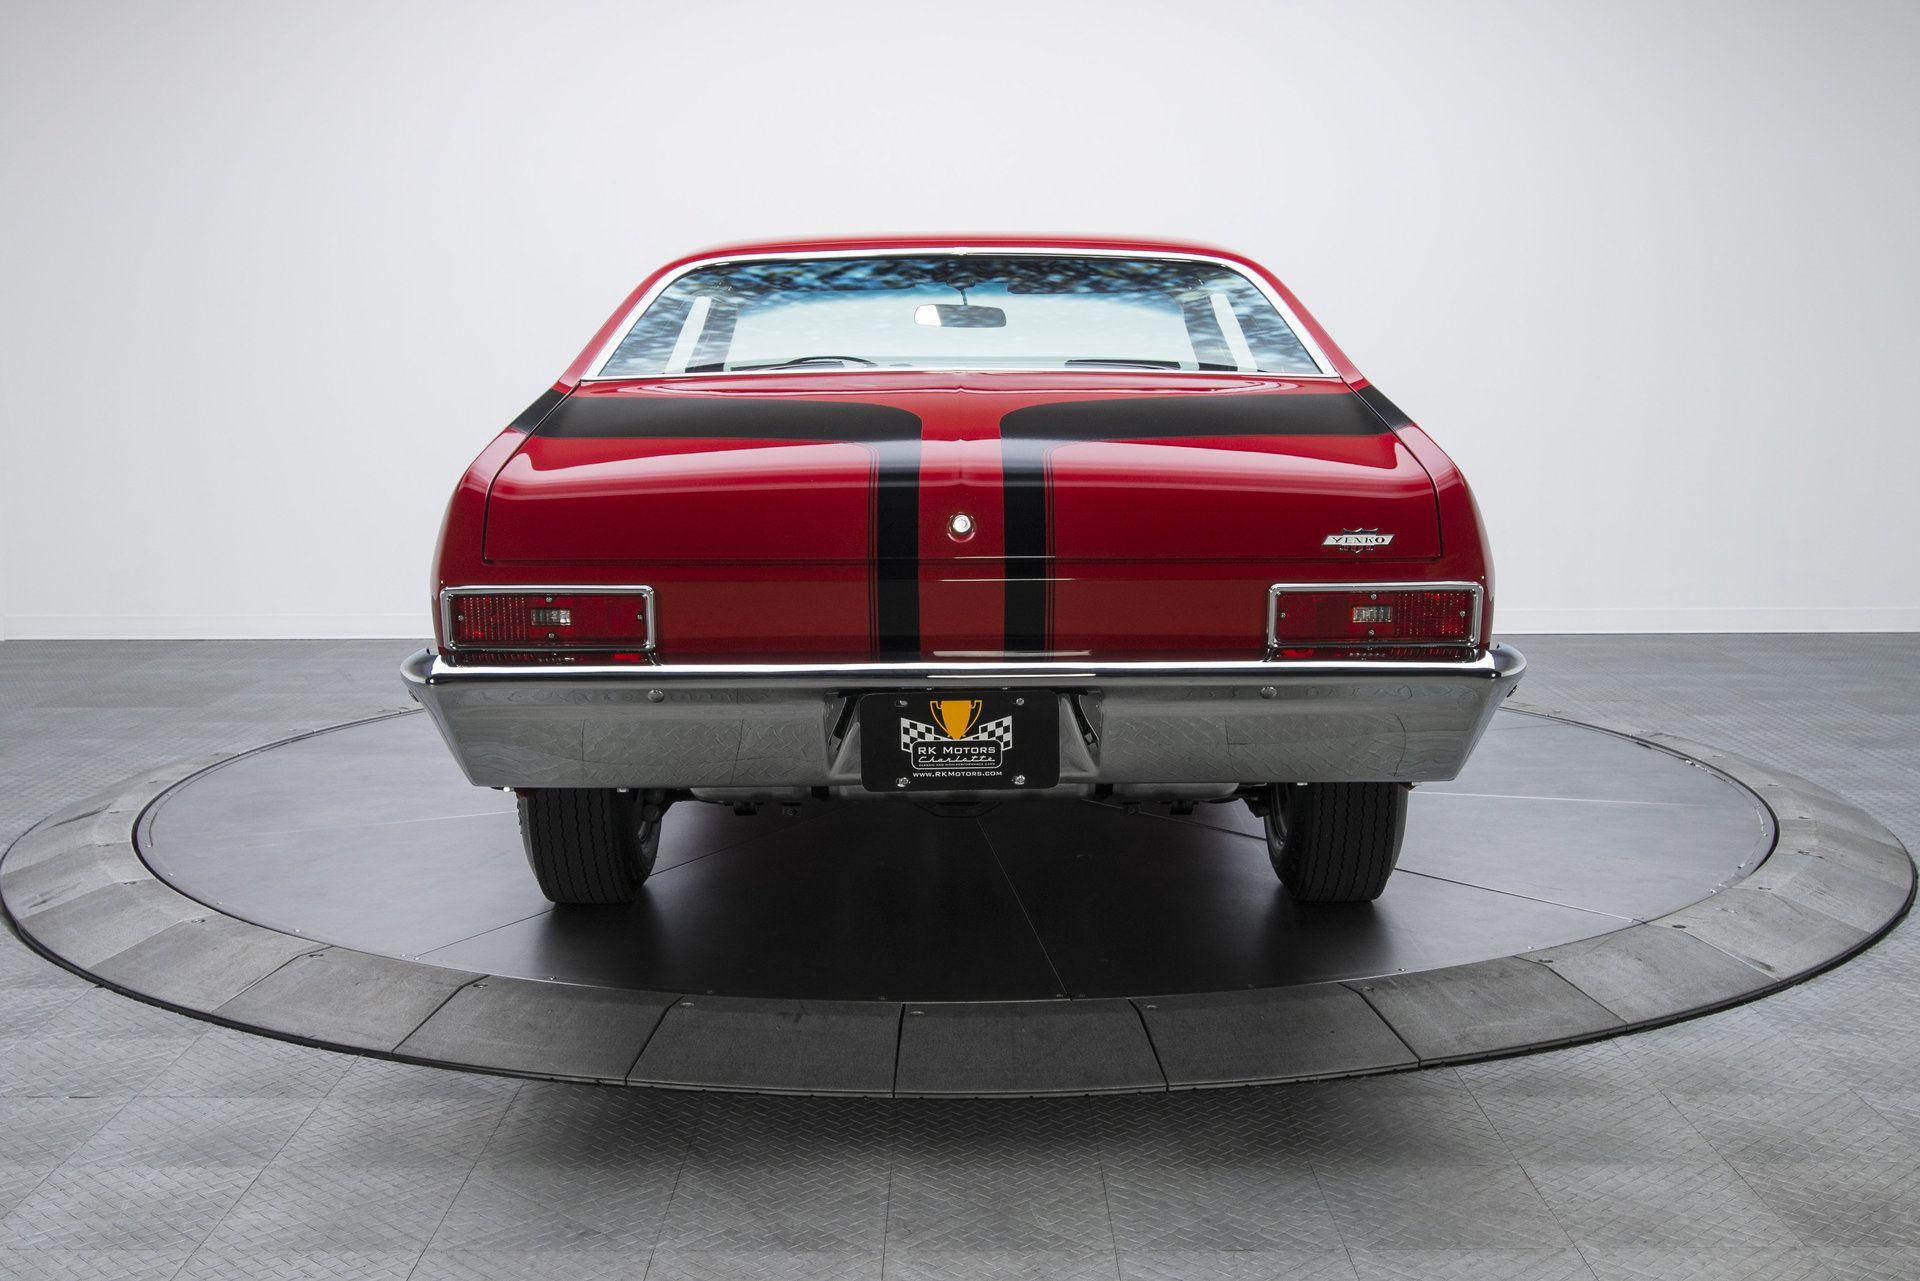 1970 Chevrolet Nova Documented Restored Numbers Matching Concours Gold Yenko Nova Deuce Lt1 350 V8 Chevrolet Nova Number Matching Chevrolet